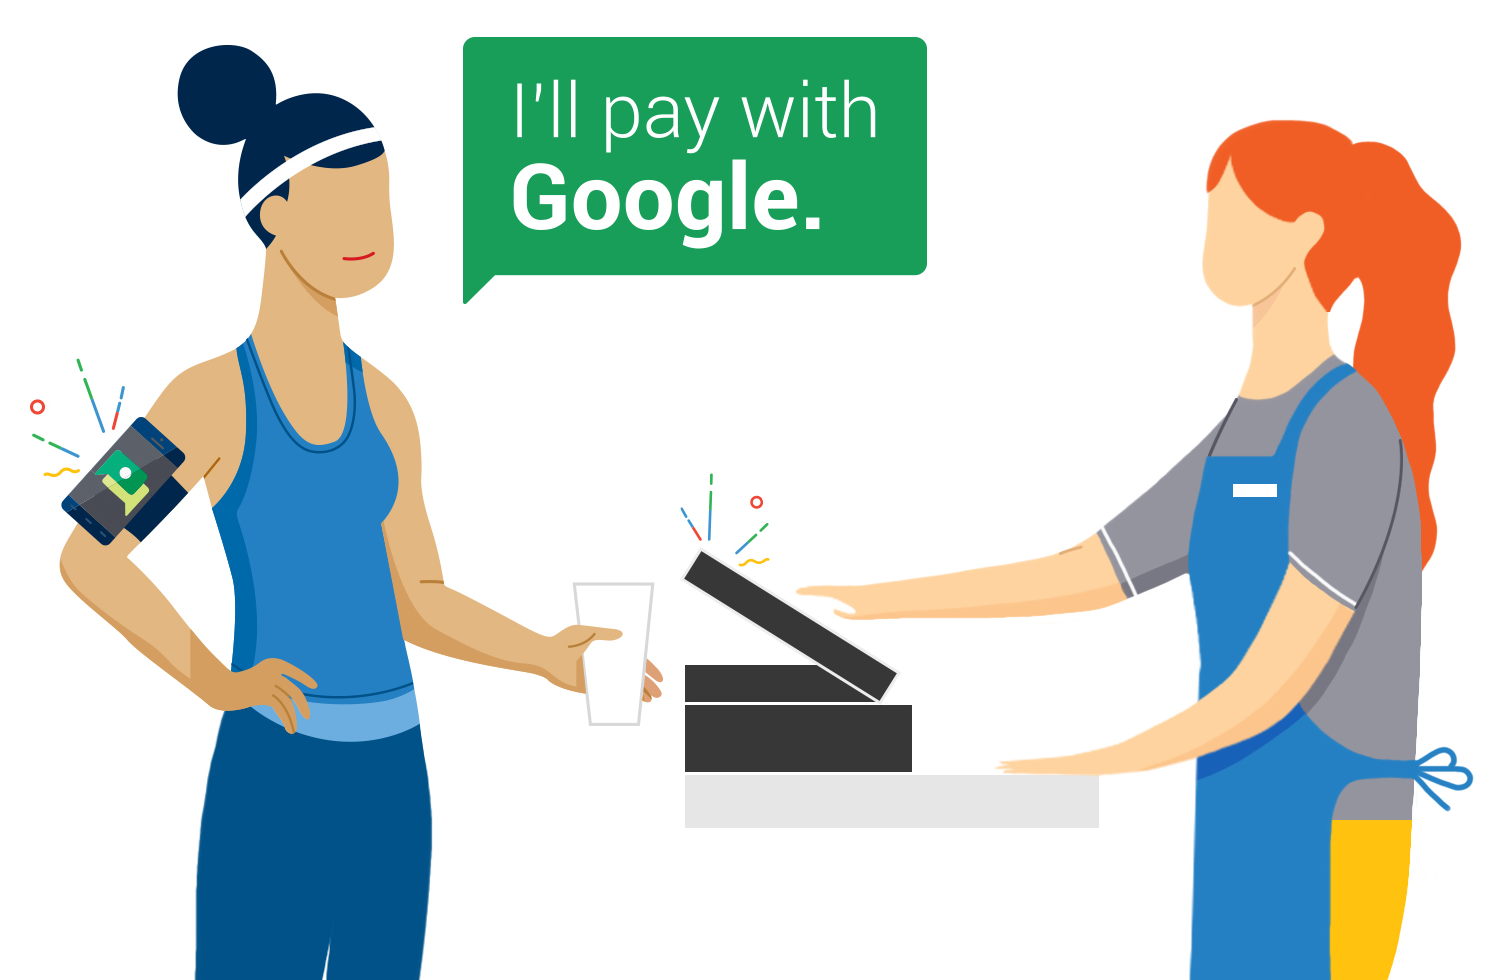 Google、スマートフォンを取り出さずに決済が可能な「Hands Free」を発表